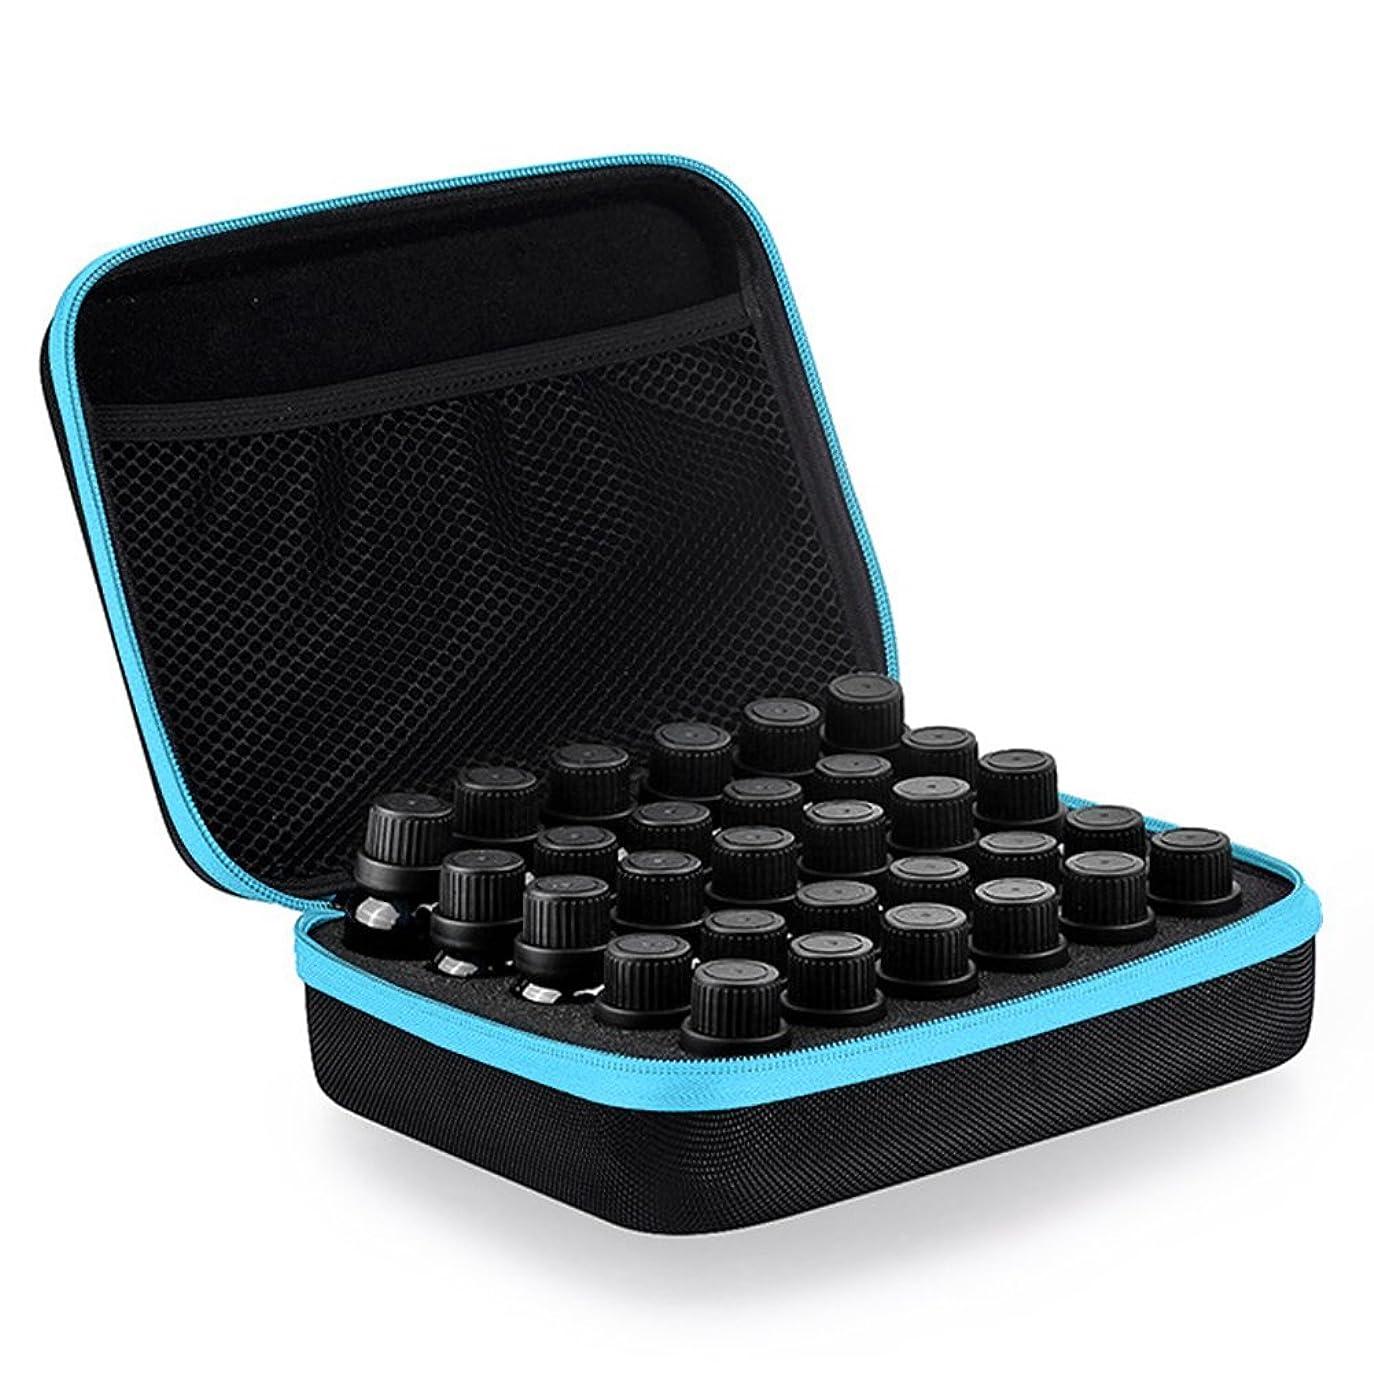 BULARY エッセンシャルオイル収納ケース エッセンシャルオイル収納ボックス プリント アロマケース 精油 ボックス 精油ケース 収納 化粧ポーチ リップクリーム ネイルポリッシュボトル アロマオイルポーチ ミニボトルケース 4色から選べる 30本用